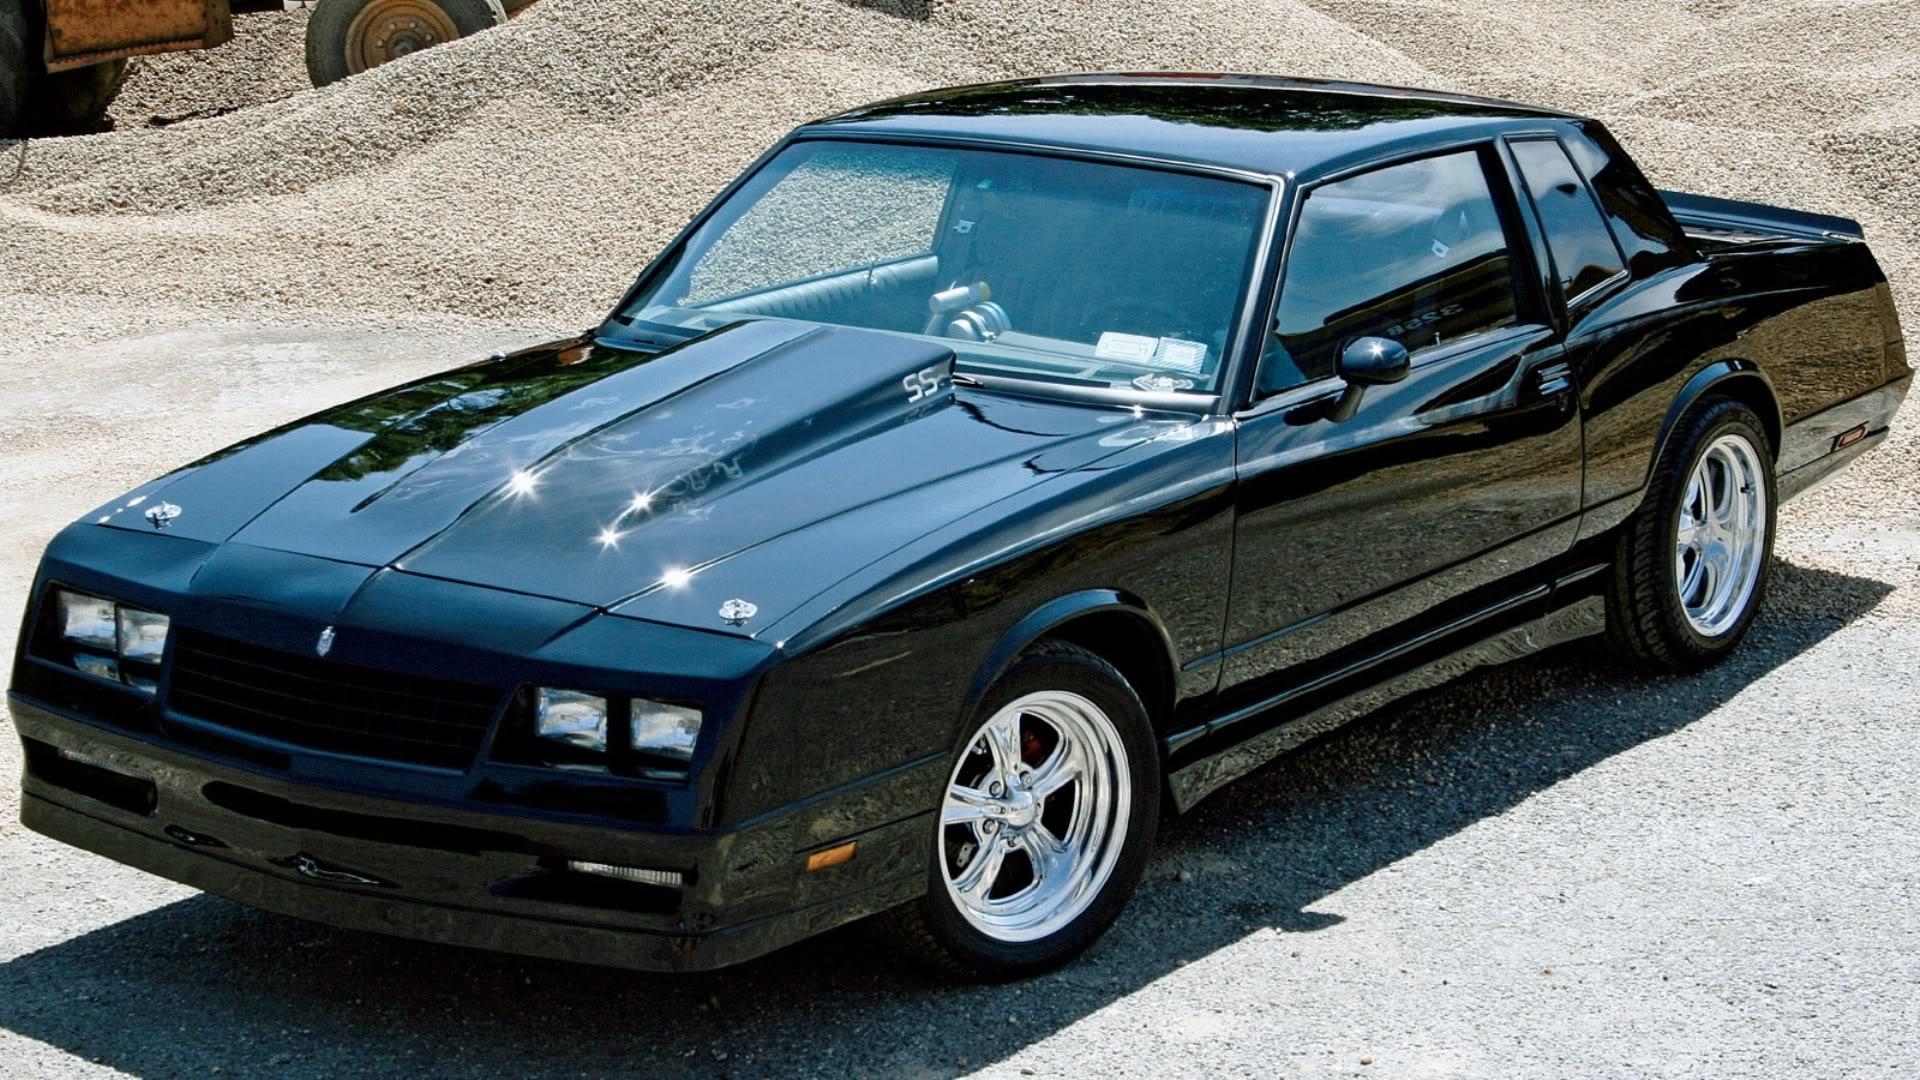 Charming Chevrolet Monte Carlo SS 1986